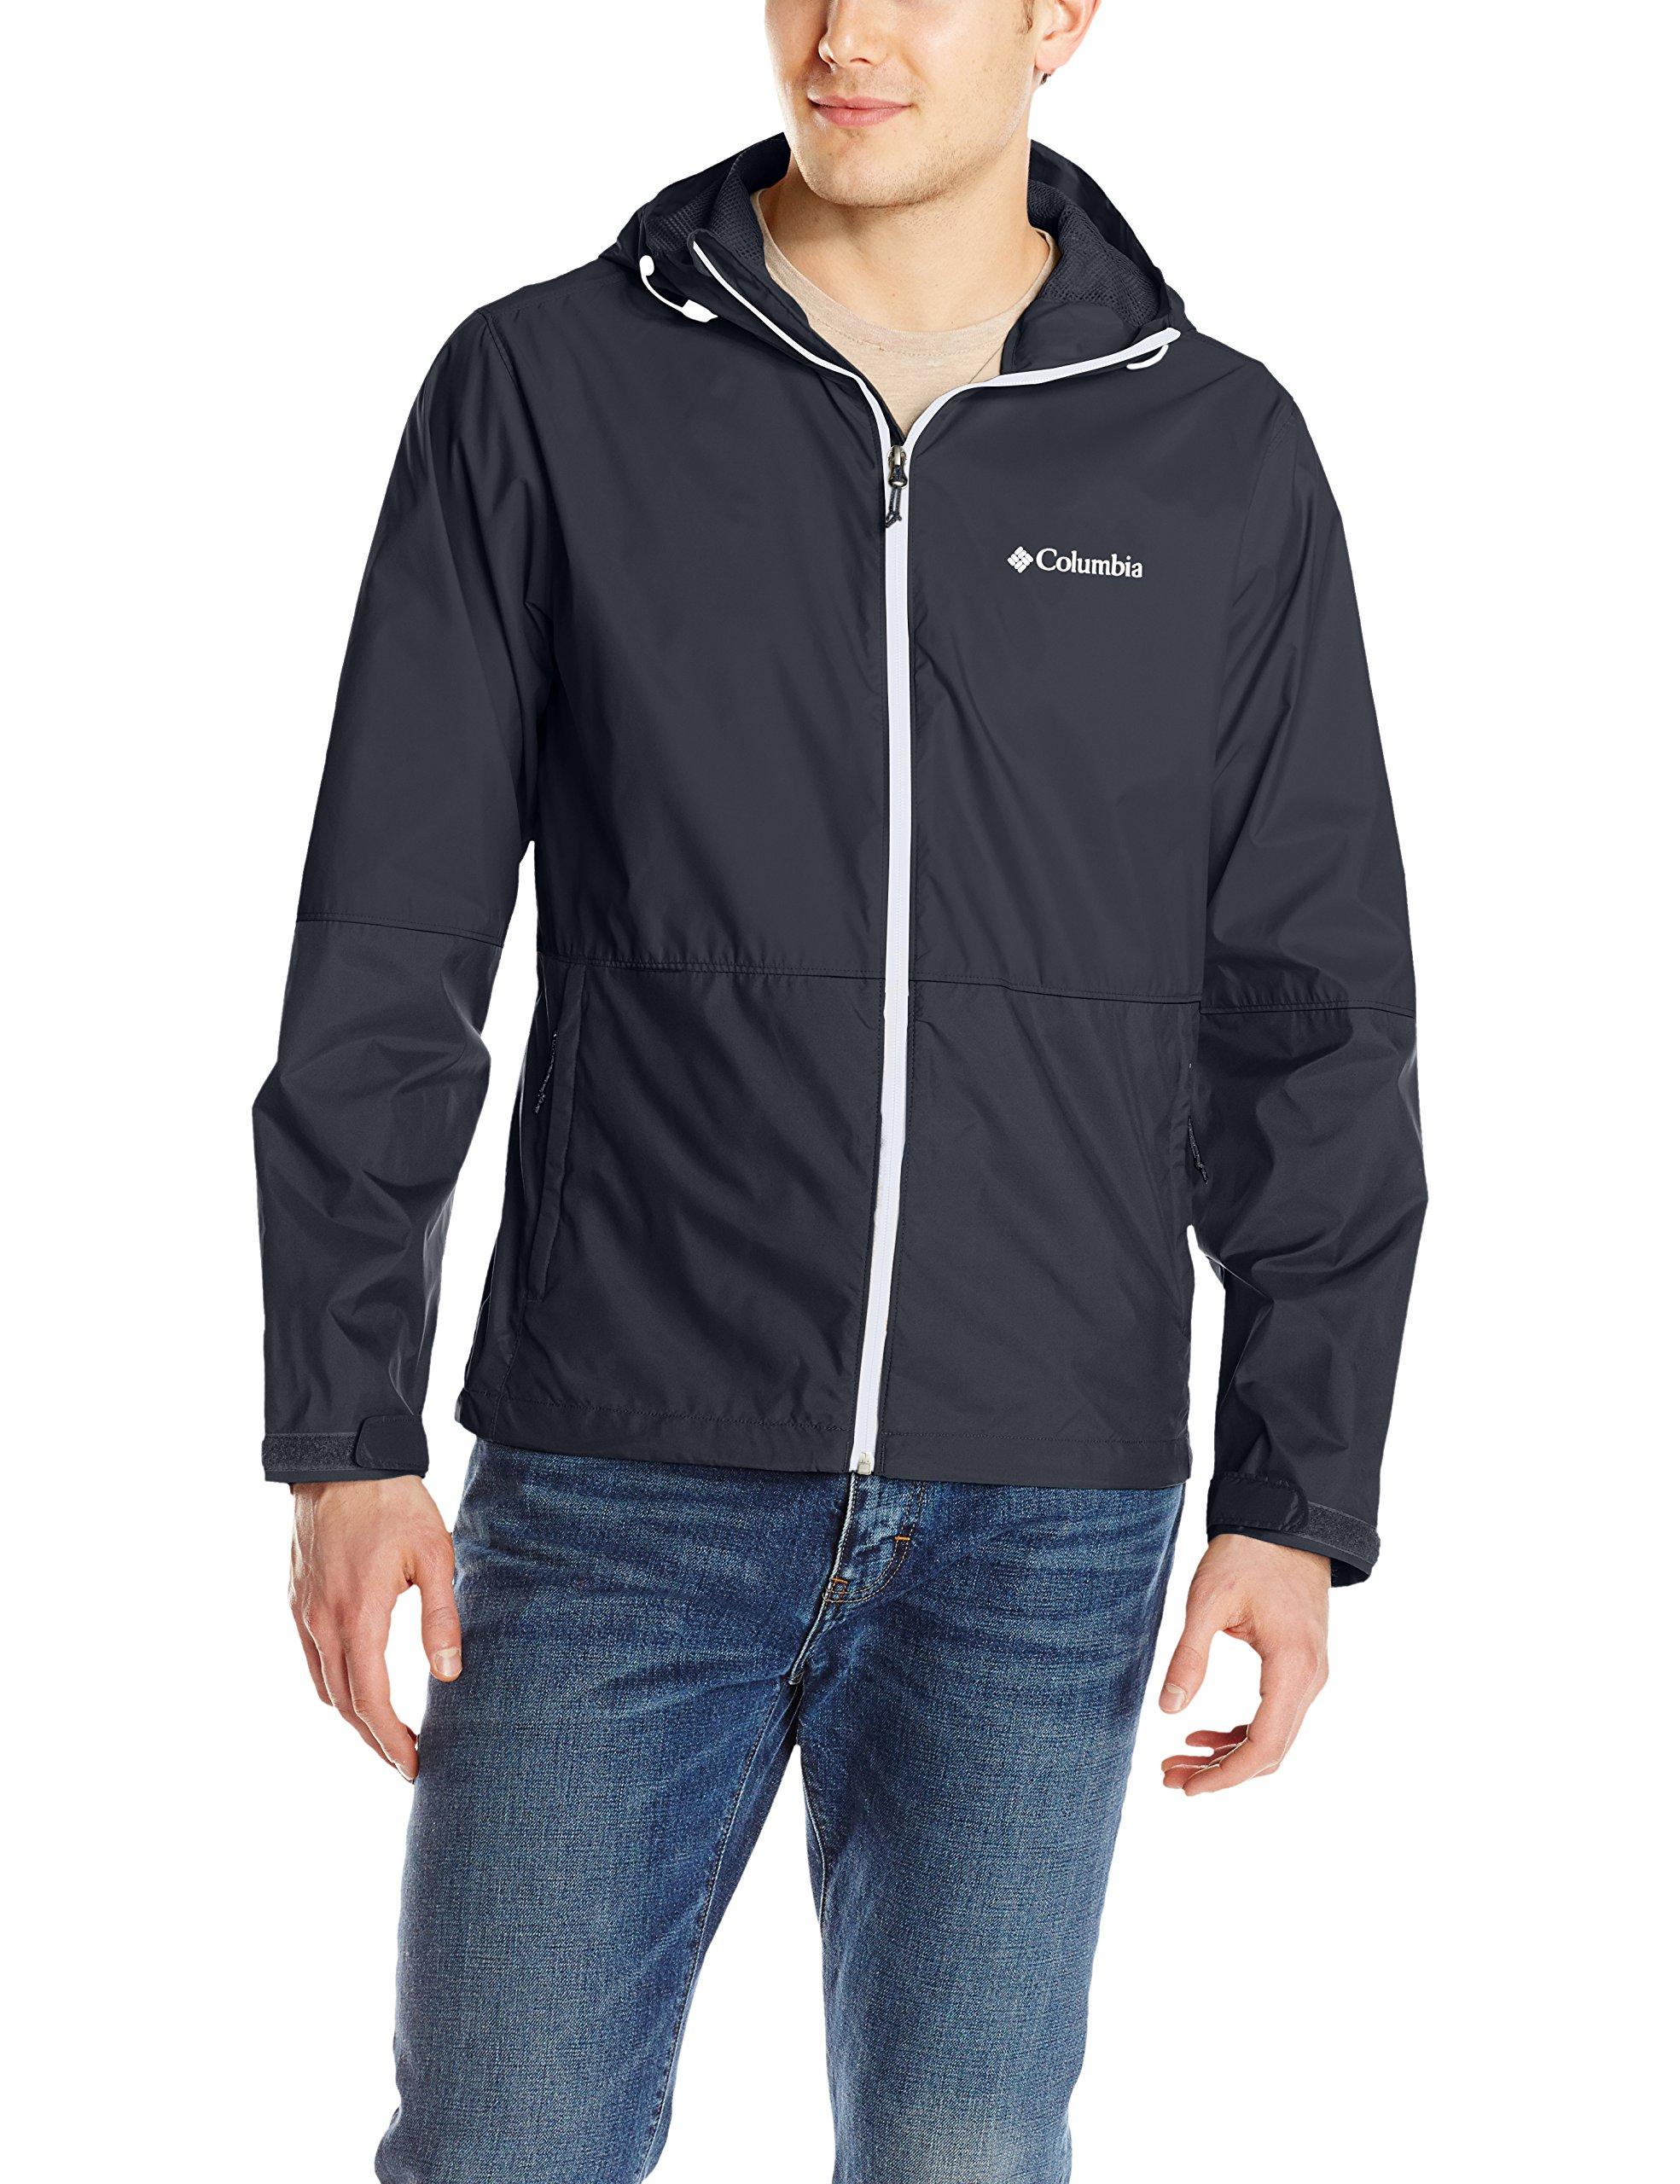 Columbia Men's Roan Mountain Jacket, Black/White, Medium